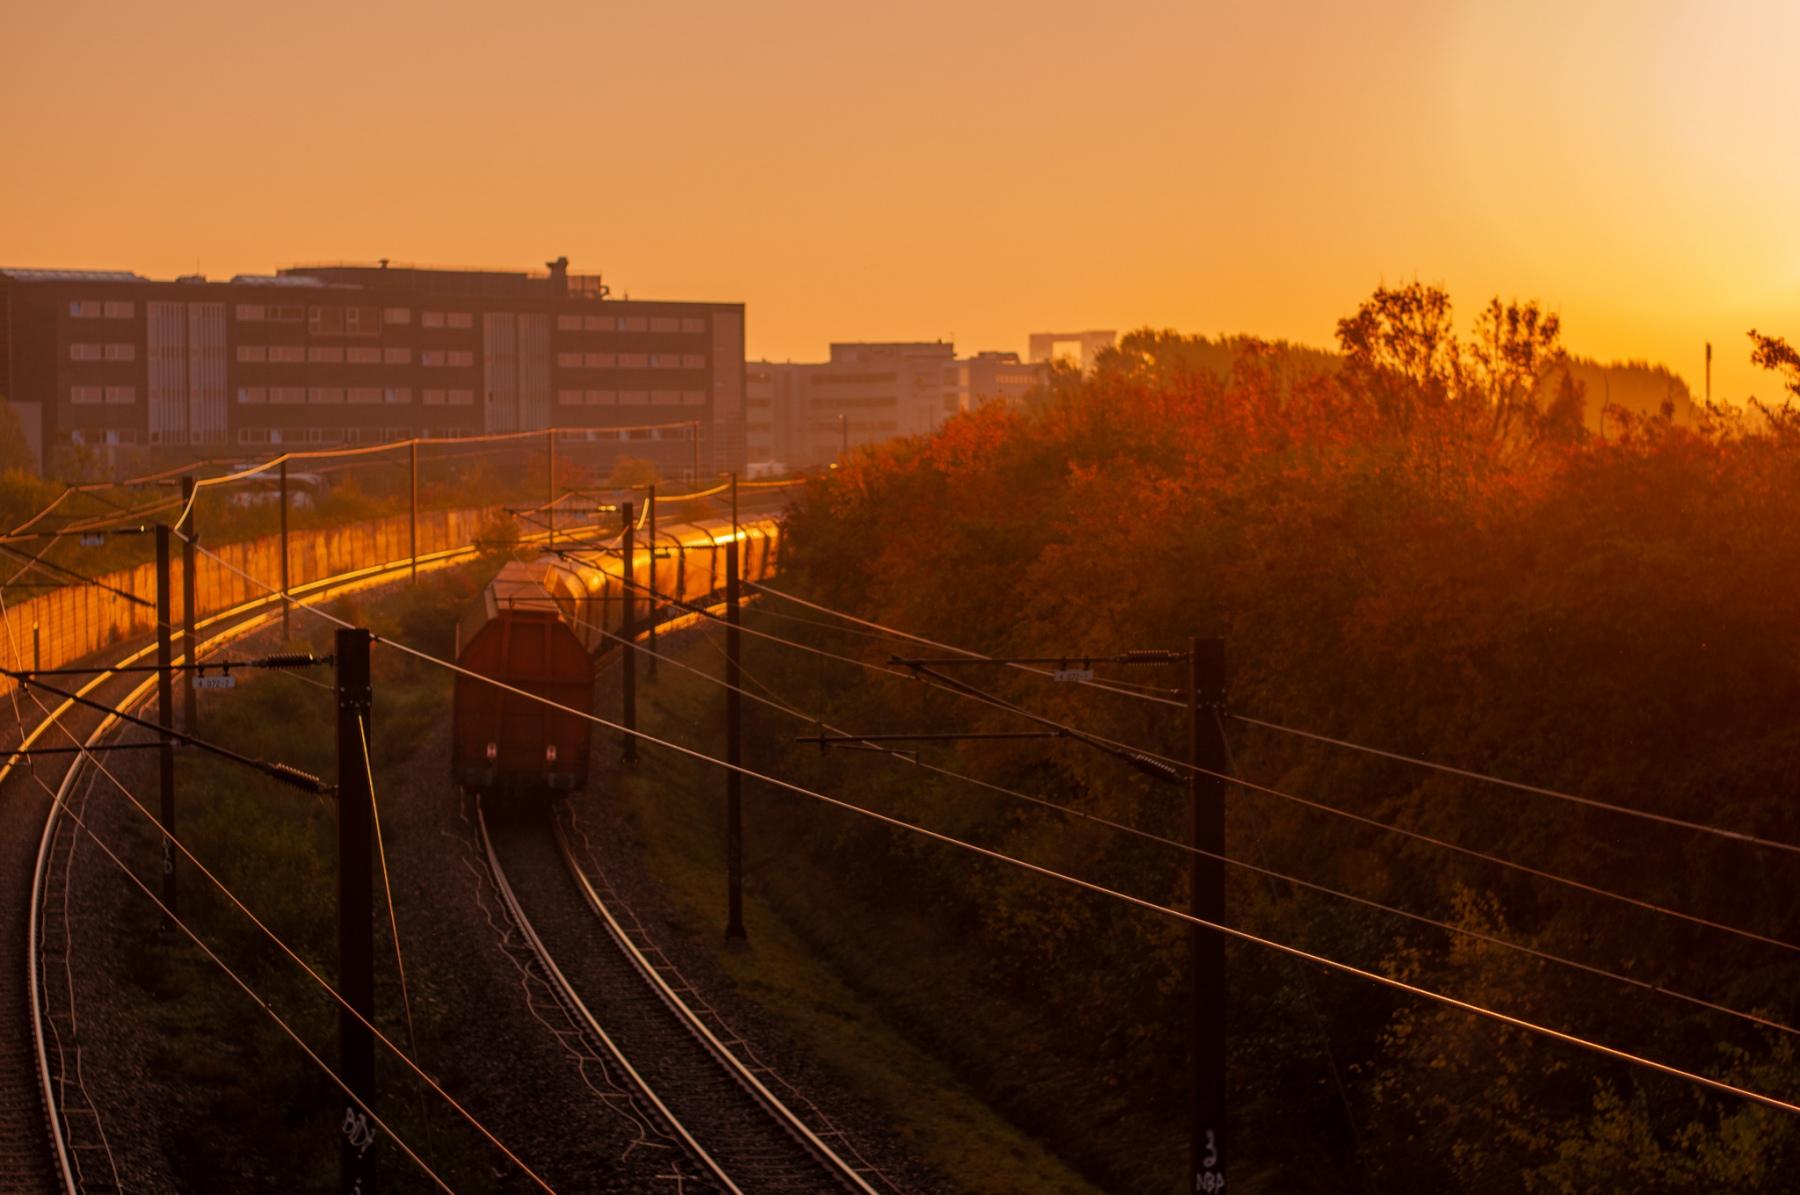 anja-blaksmark-godsbanen-sydhavn